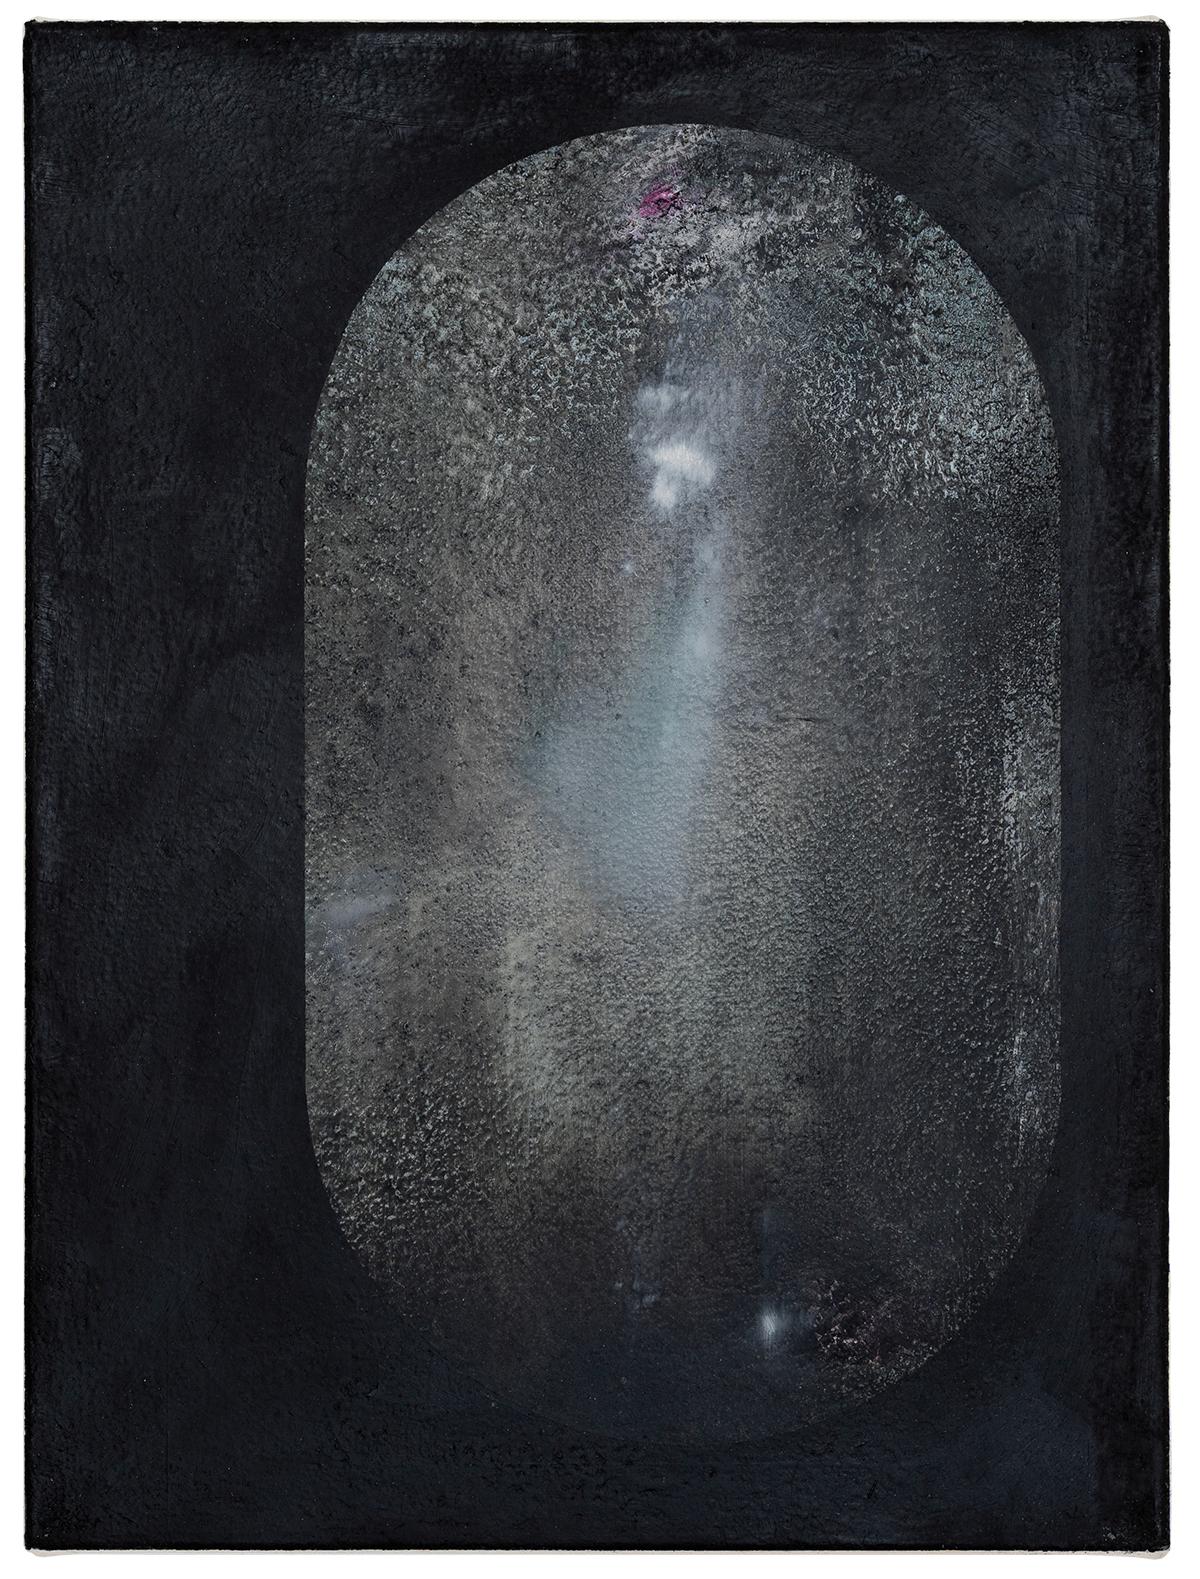 Kate Andrews, diver, 2021, Oil on canvas, 40 x 30 cm